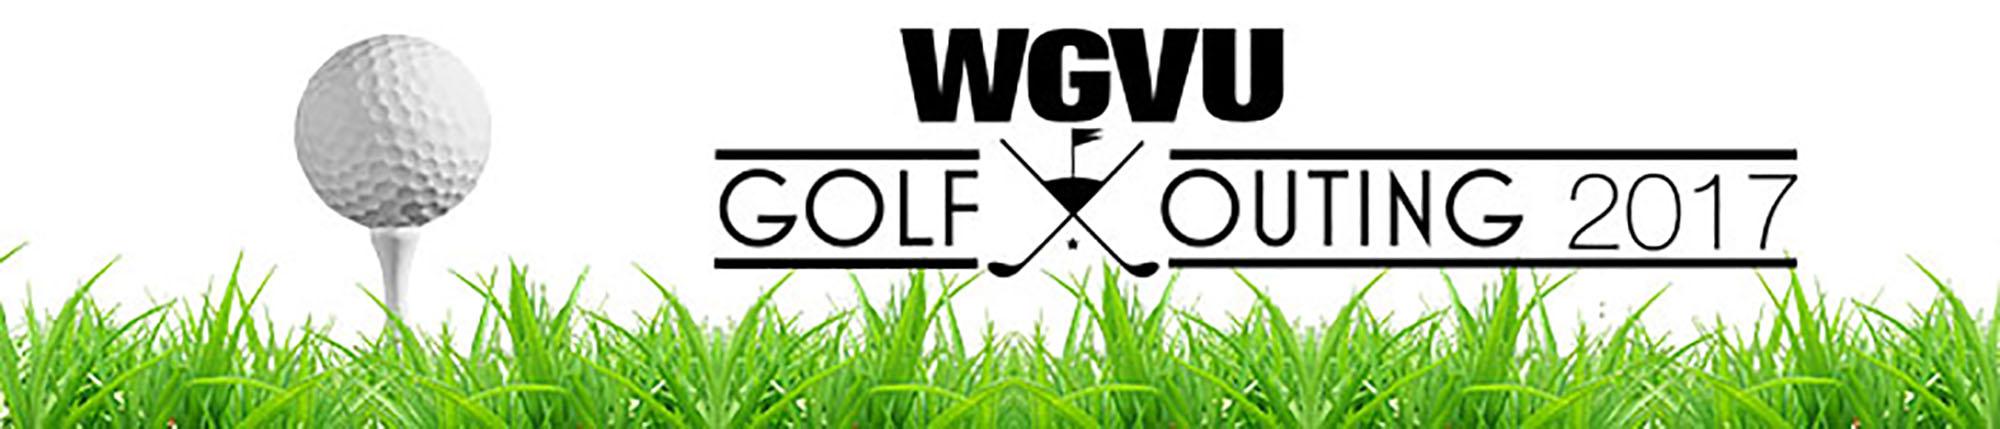 Golf Banner web_lg.jpg